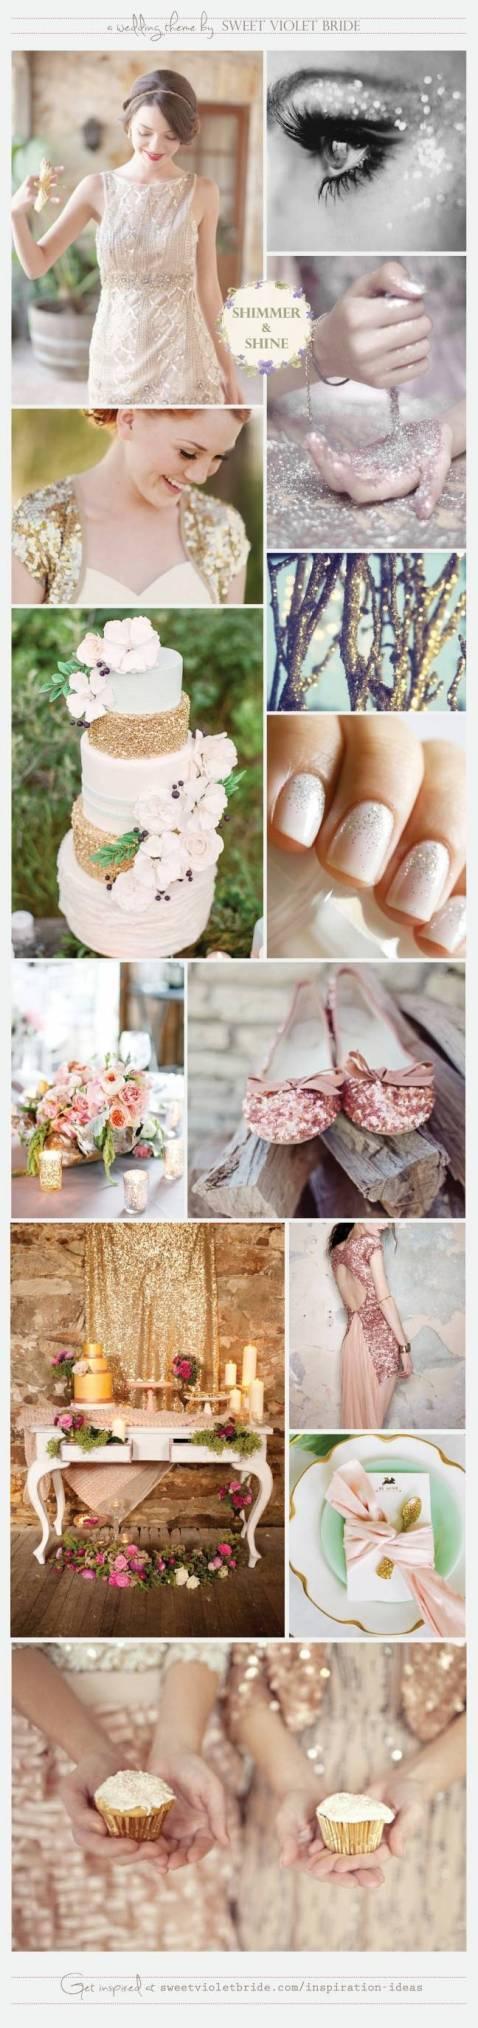 Wedding Inspiration Board #17: Shimmer & Shine